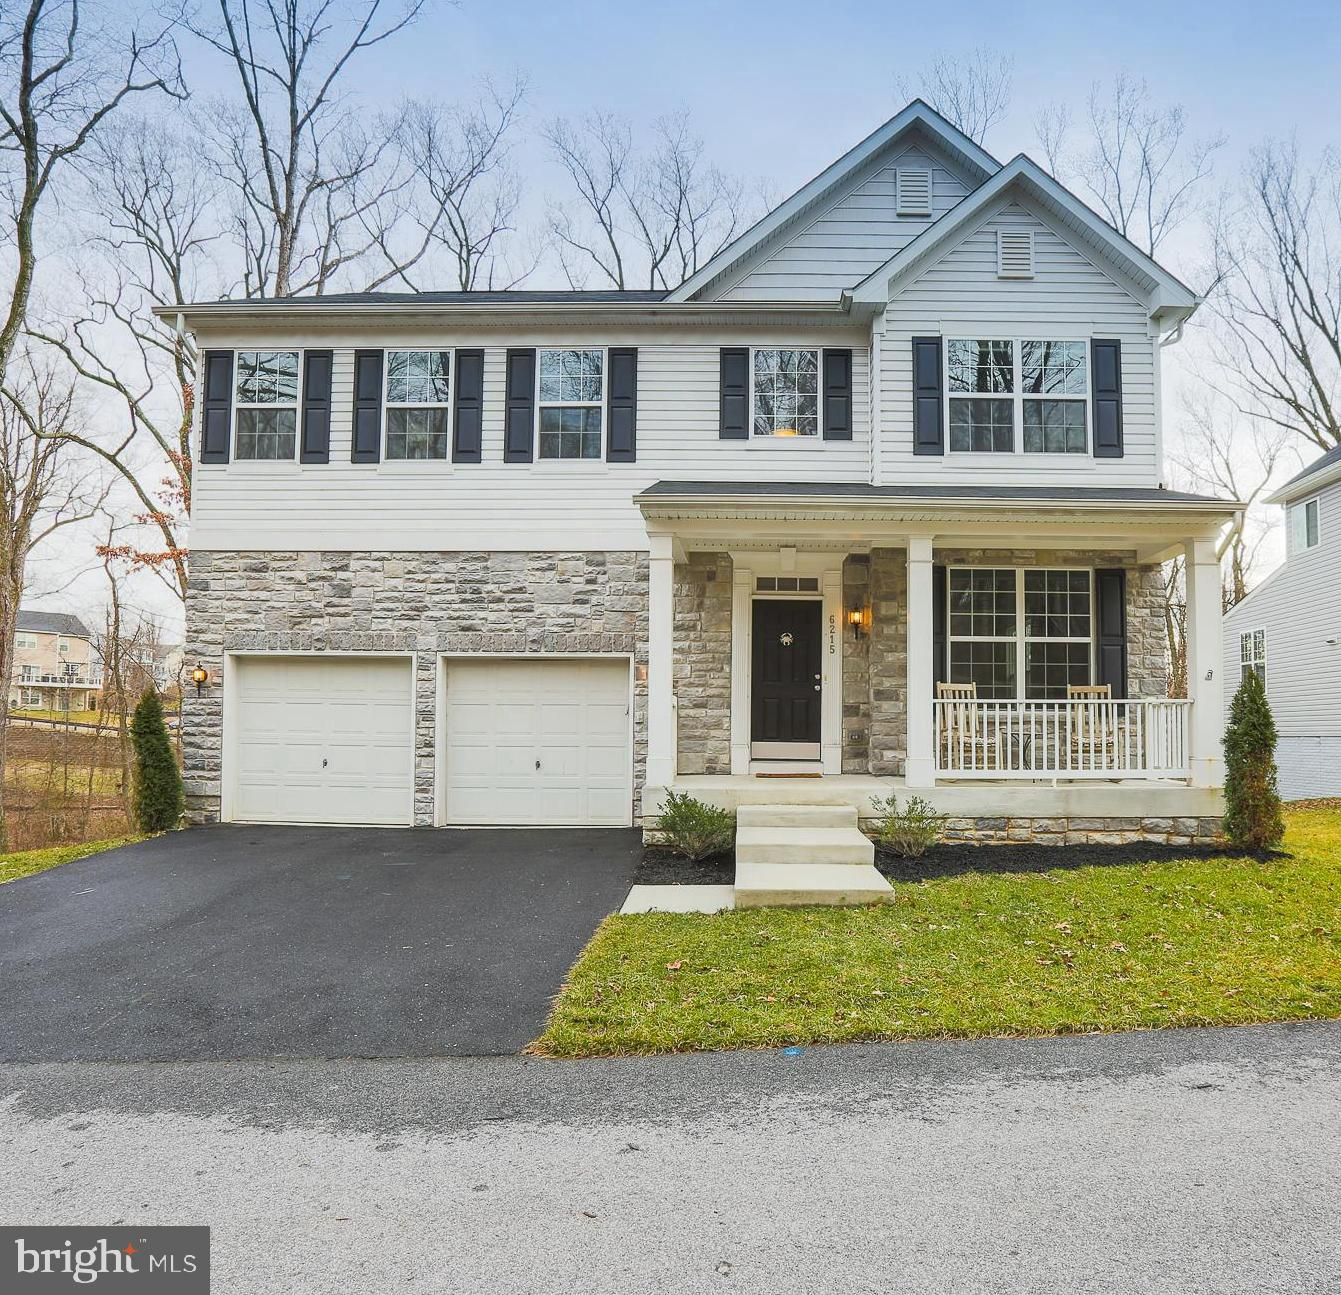 Single Family Home for Sale at 6215 Sweet Gum Lane 6215 Sweet Gum Lane Hanover, Maryland 21076 United States